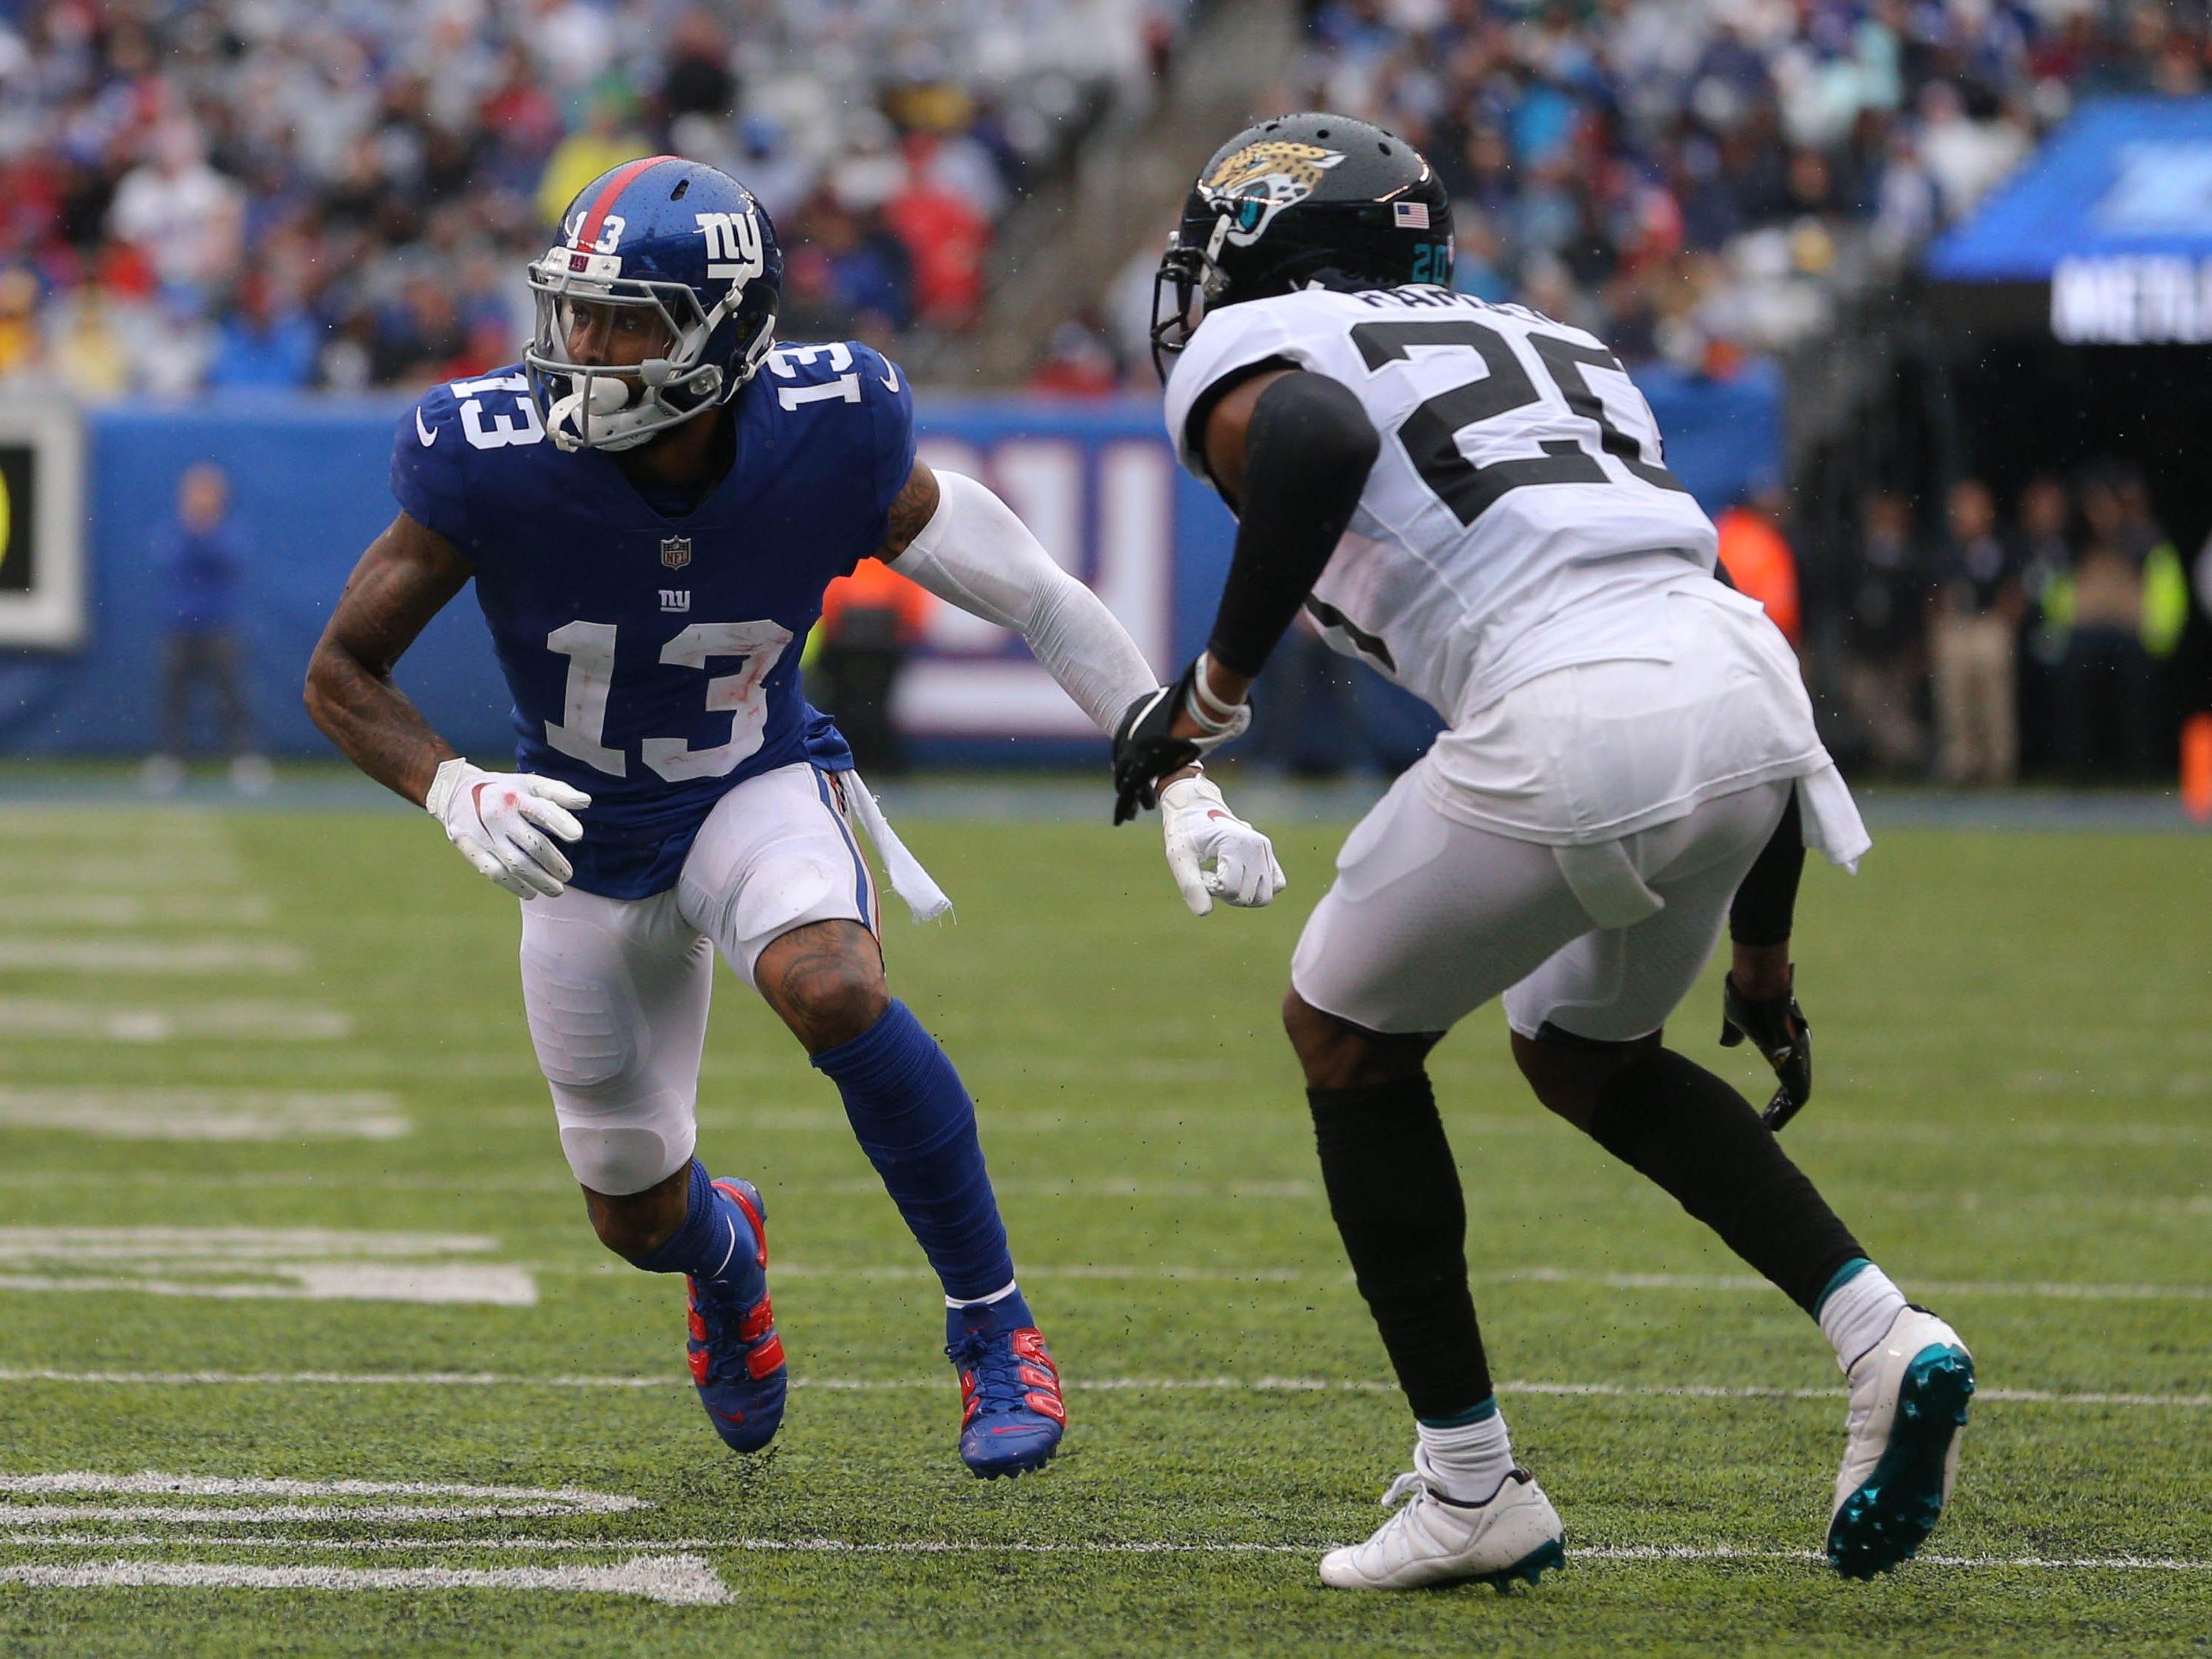 New York Giants wide receiver Odell Beckham Jr. runs a route against Jacksonville Jaguars cornerback Jalen Ramsey during the second quarter at MetLife Stadium.